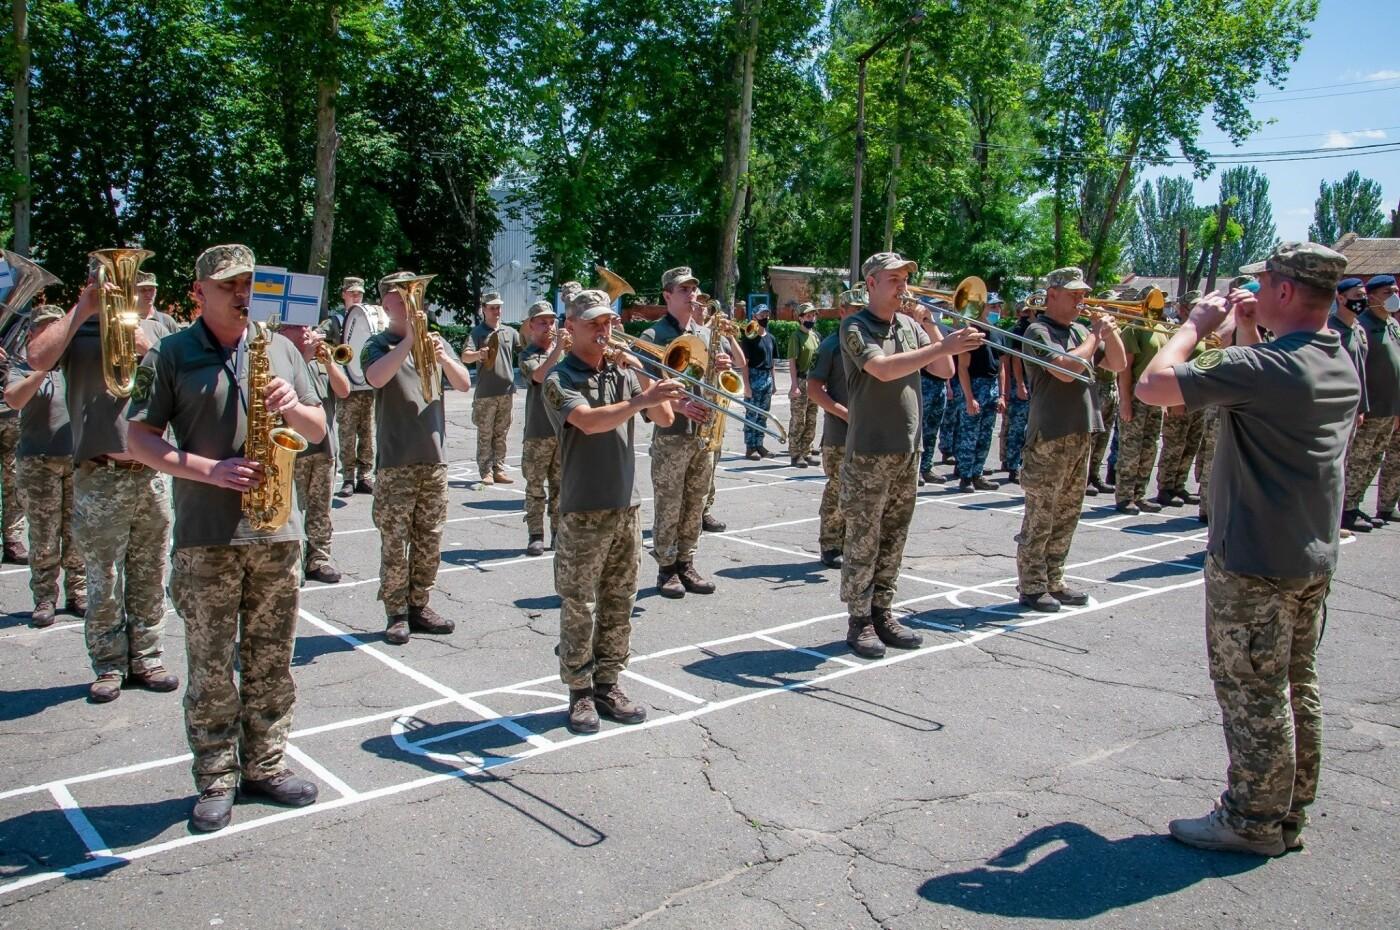 В Николаеве открыли школу морского пехотинца на базе учебного центра ВМФ, фото-3